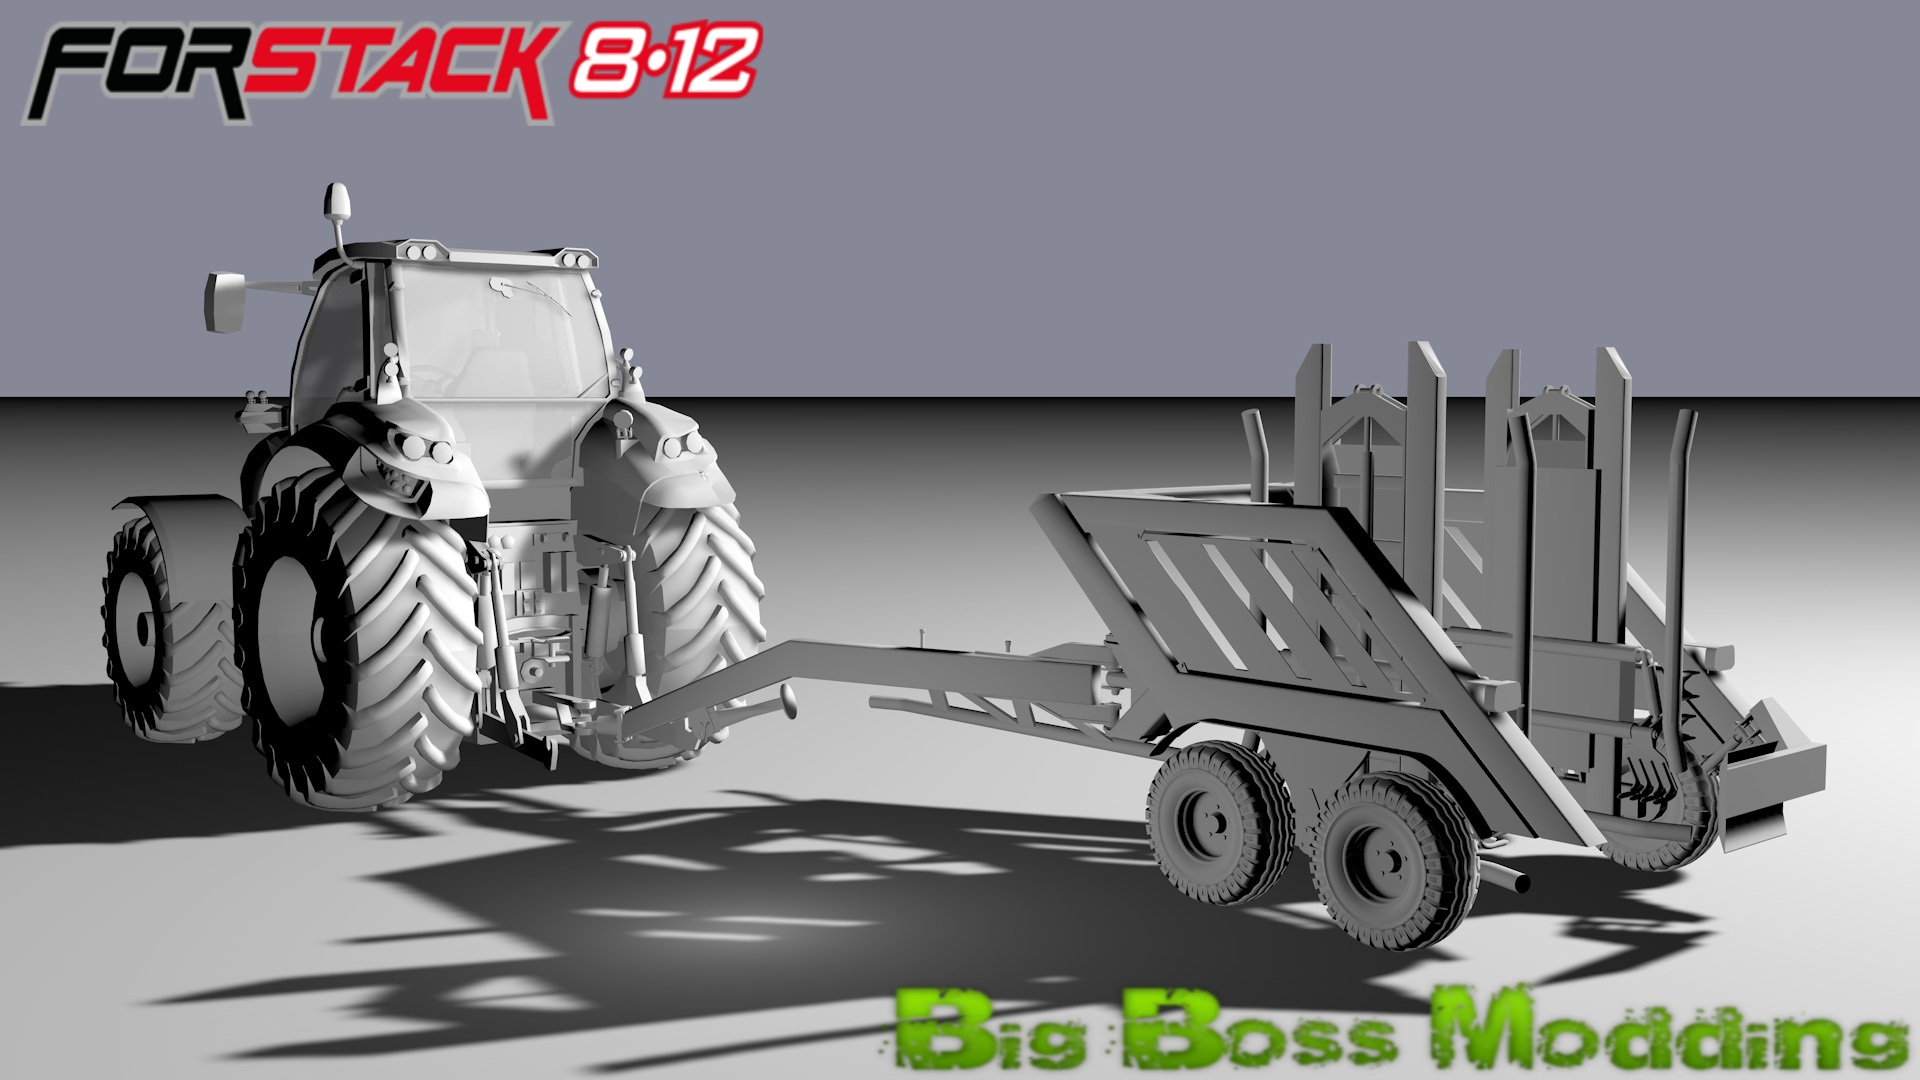 [T.E.P.] Arcusin ForStack 8-12 [Actualizado 30-5-2014] Contractor48ij2r